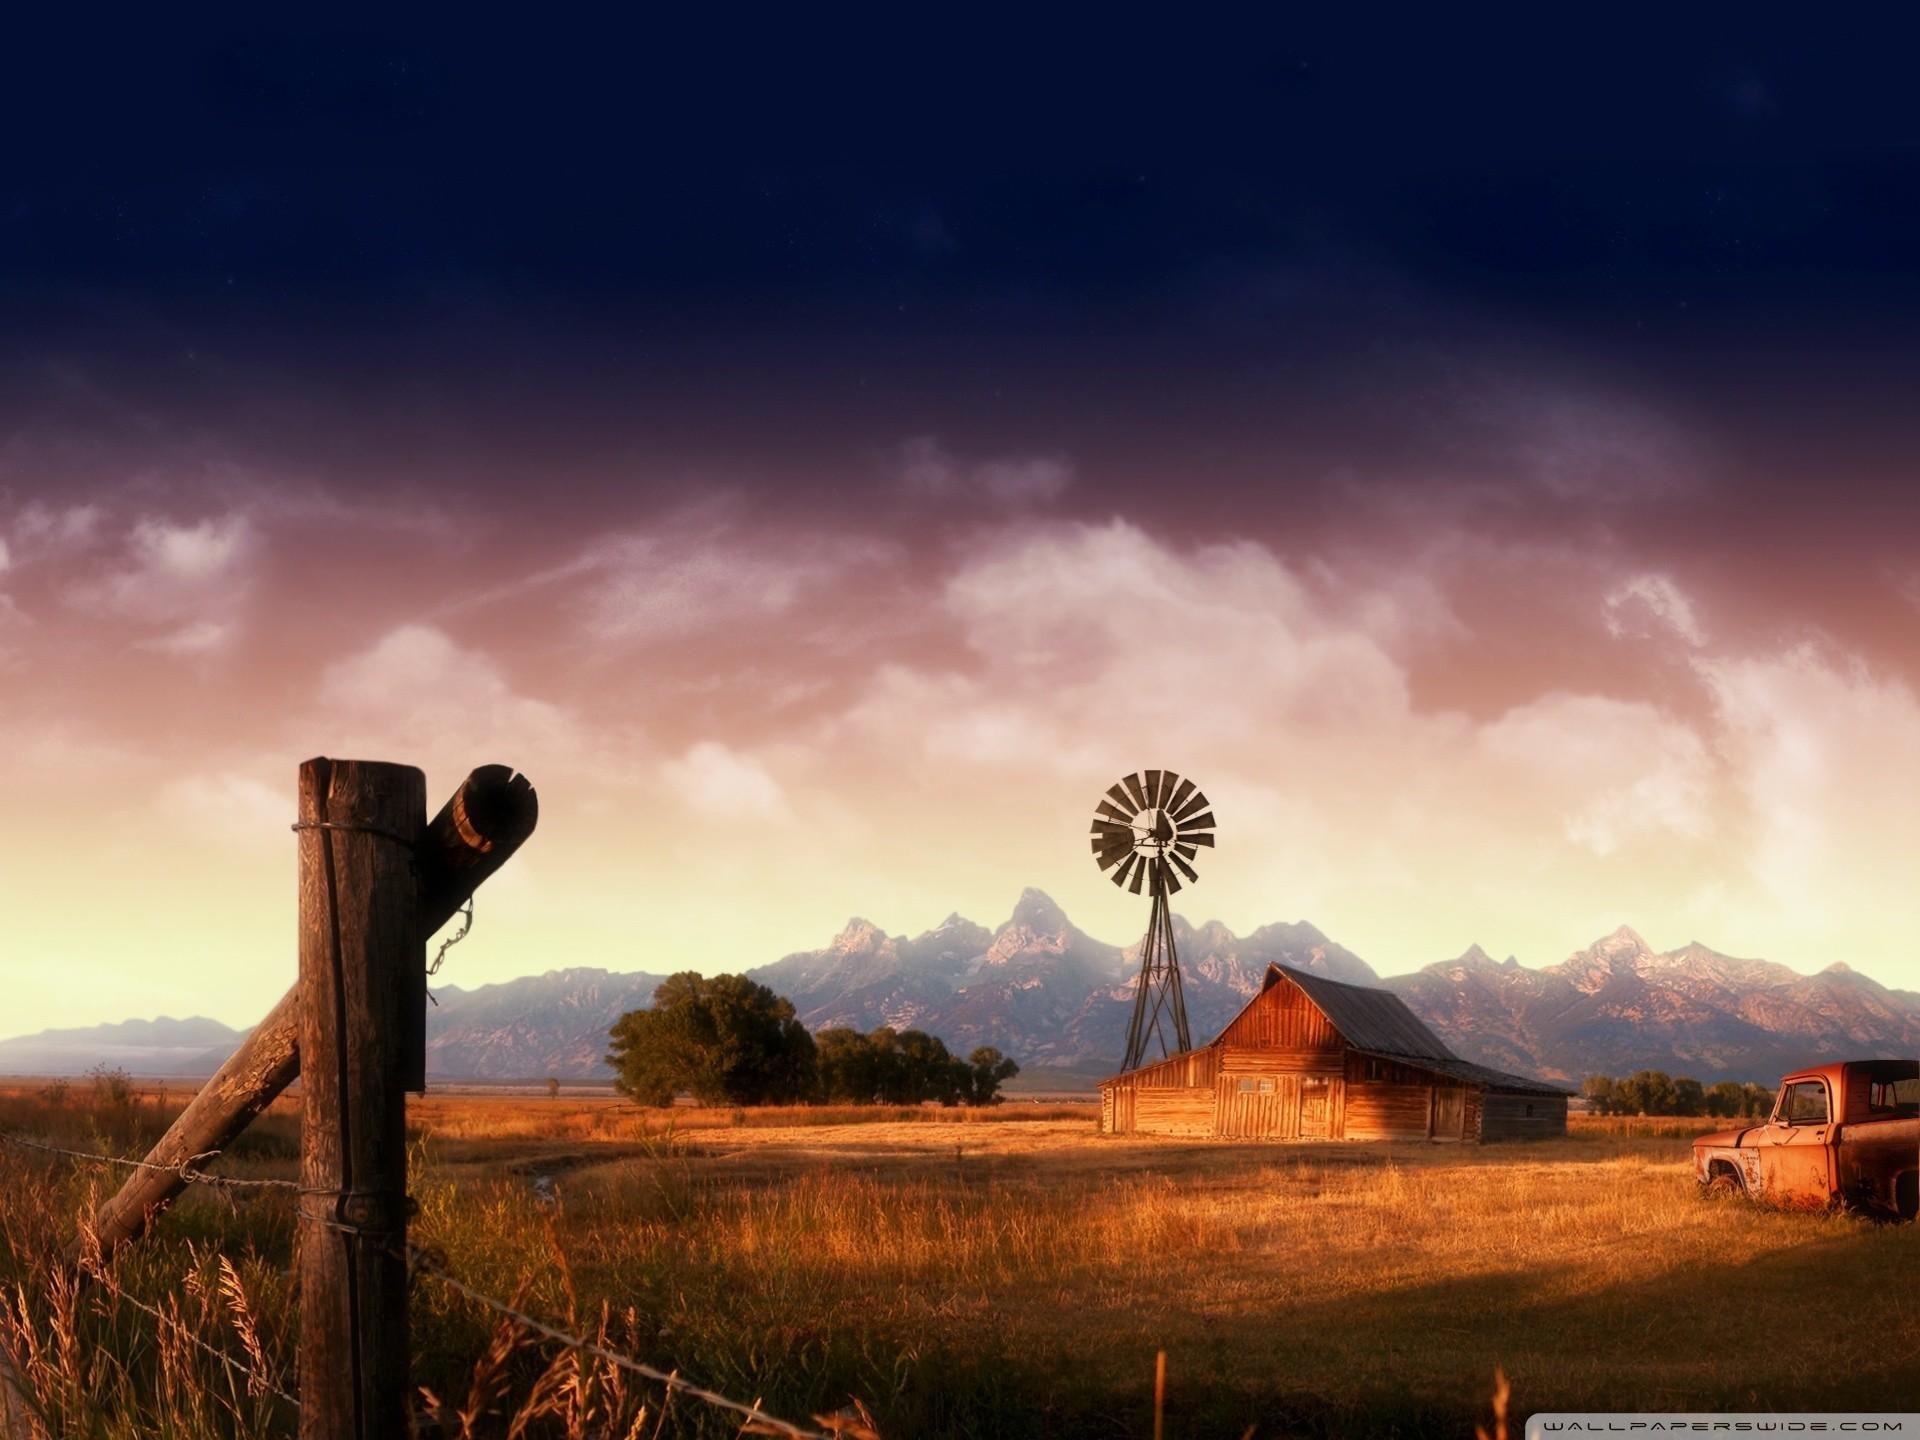 Res: 1920x1440, download-free-western-desktop-wallpaper--photo-WTG311172